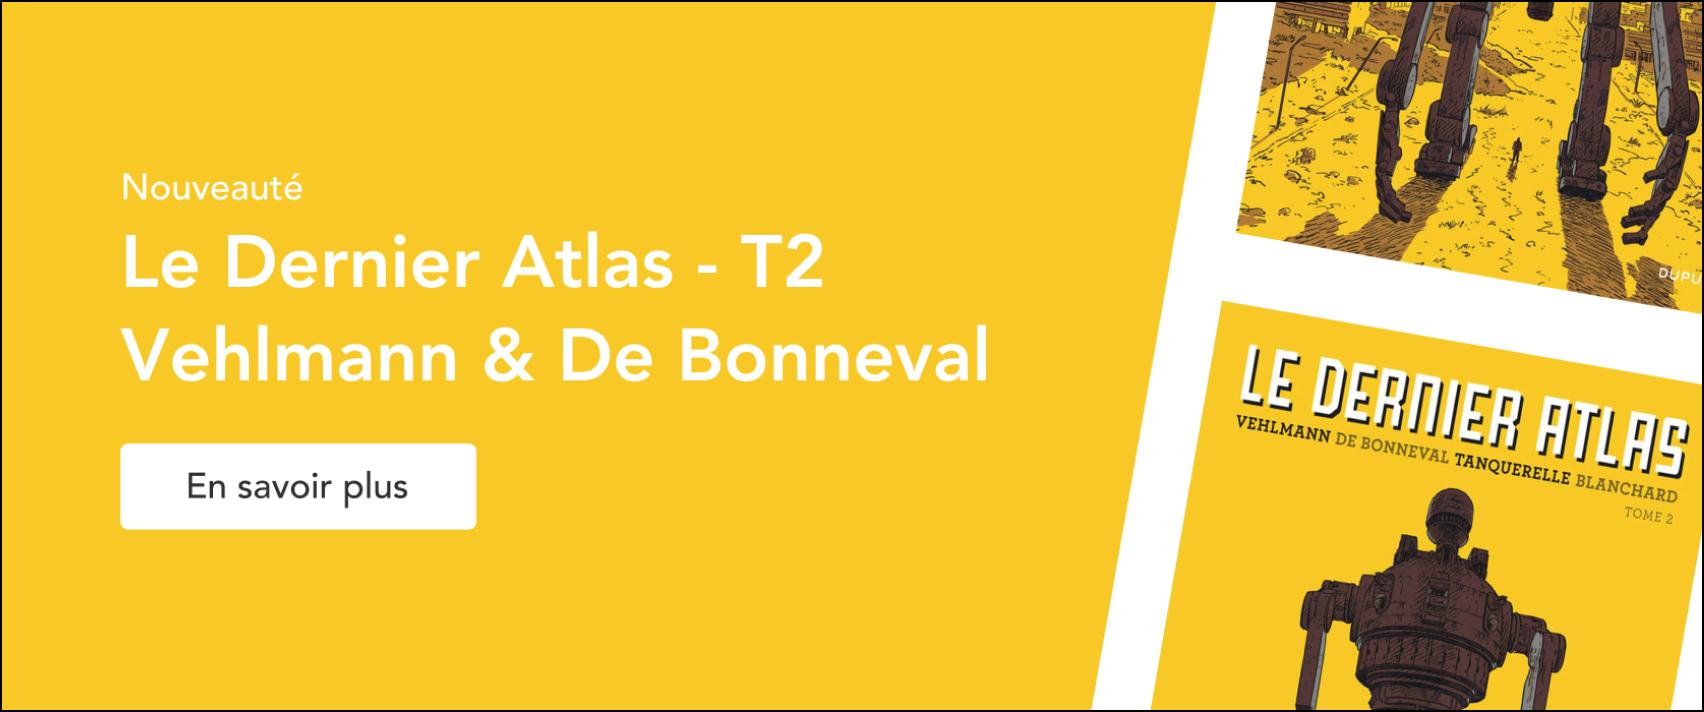 Le Dernier Atlas T2